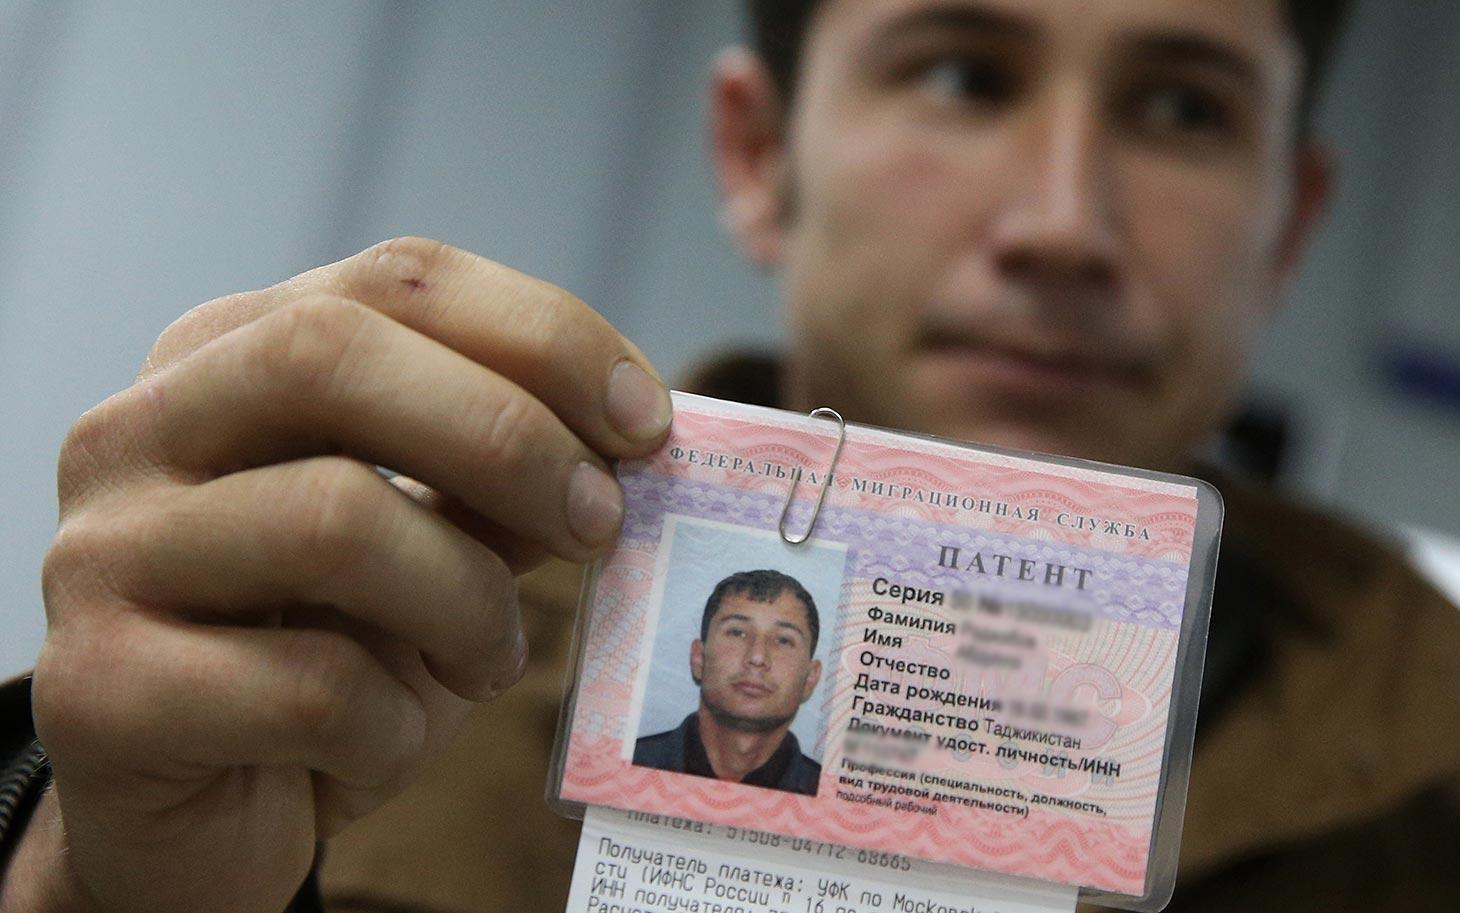 Патент на работу для граждан Украины в 2018 г 37